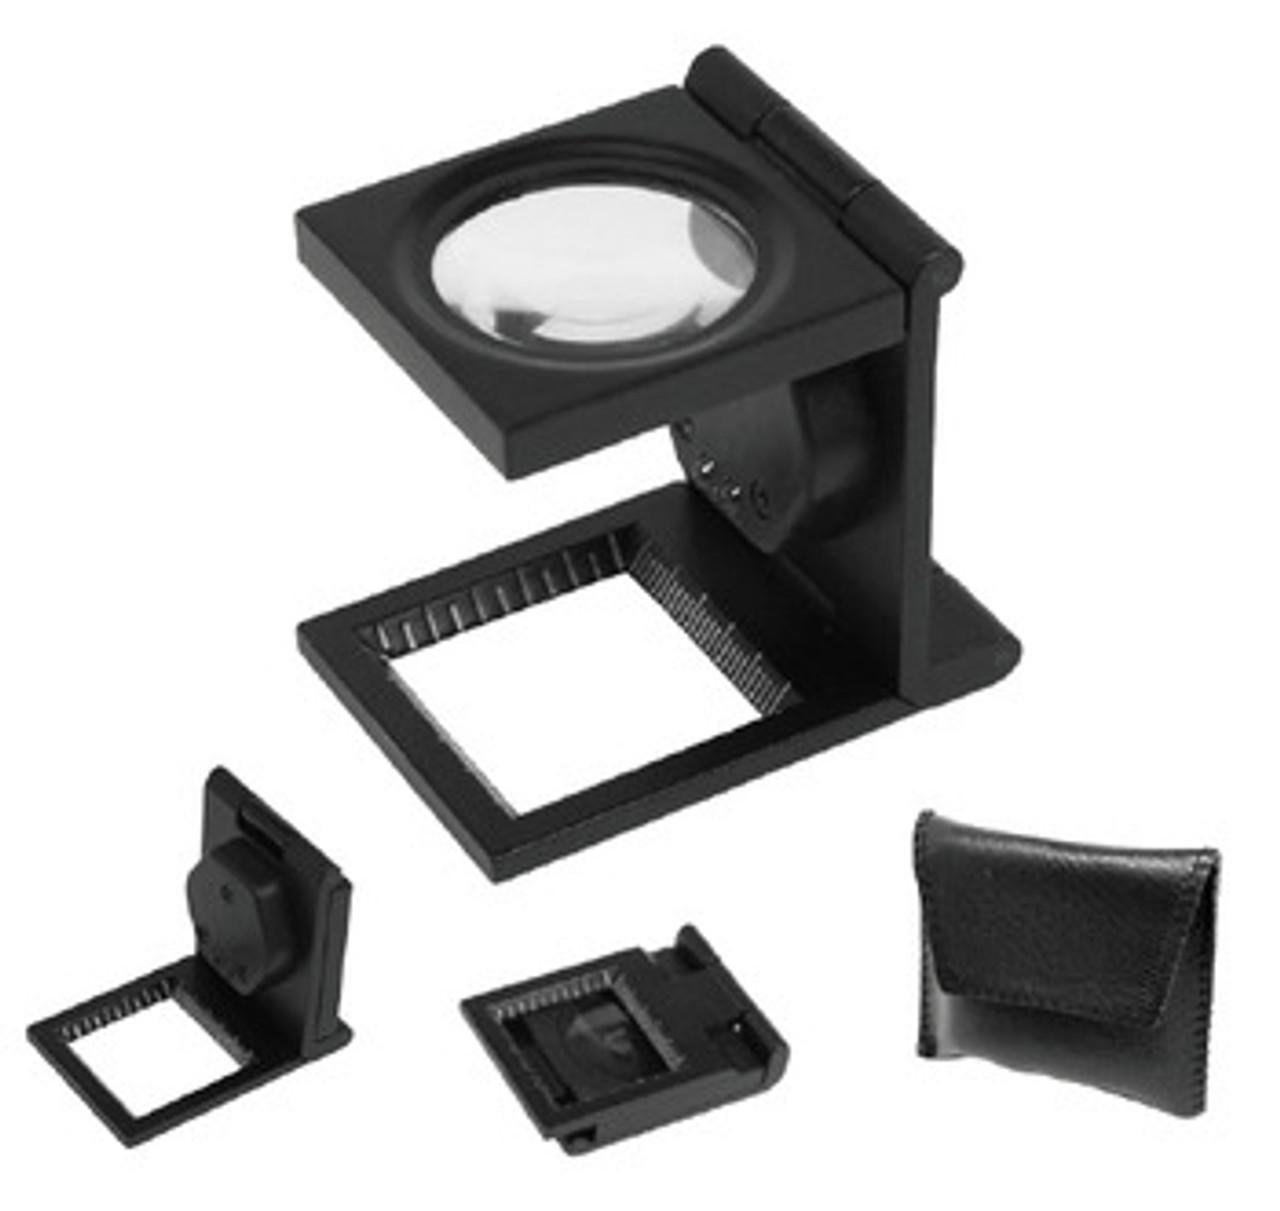 8X Metal Folding Linen Tester , Magnifier with LED Light , fls-LTM8X